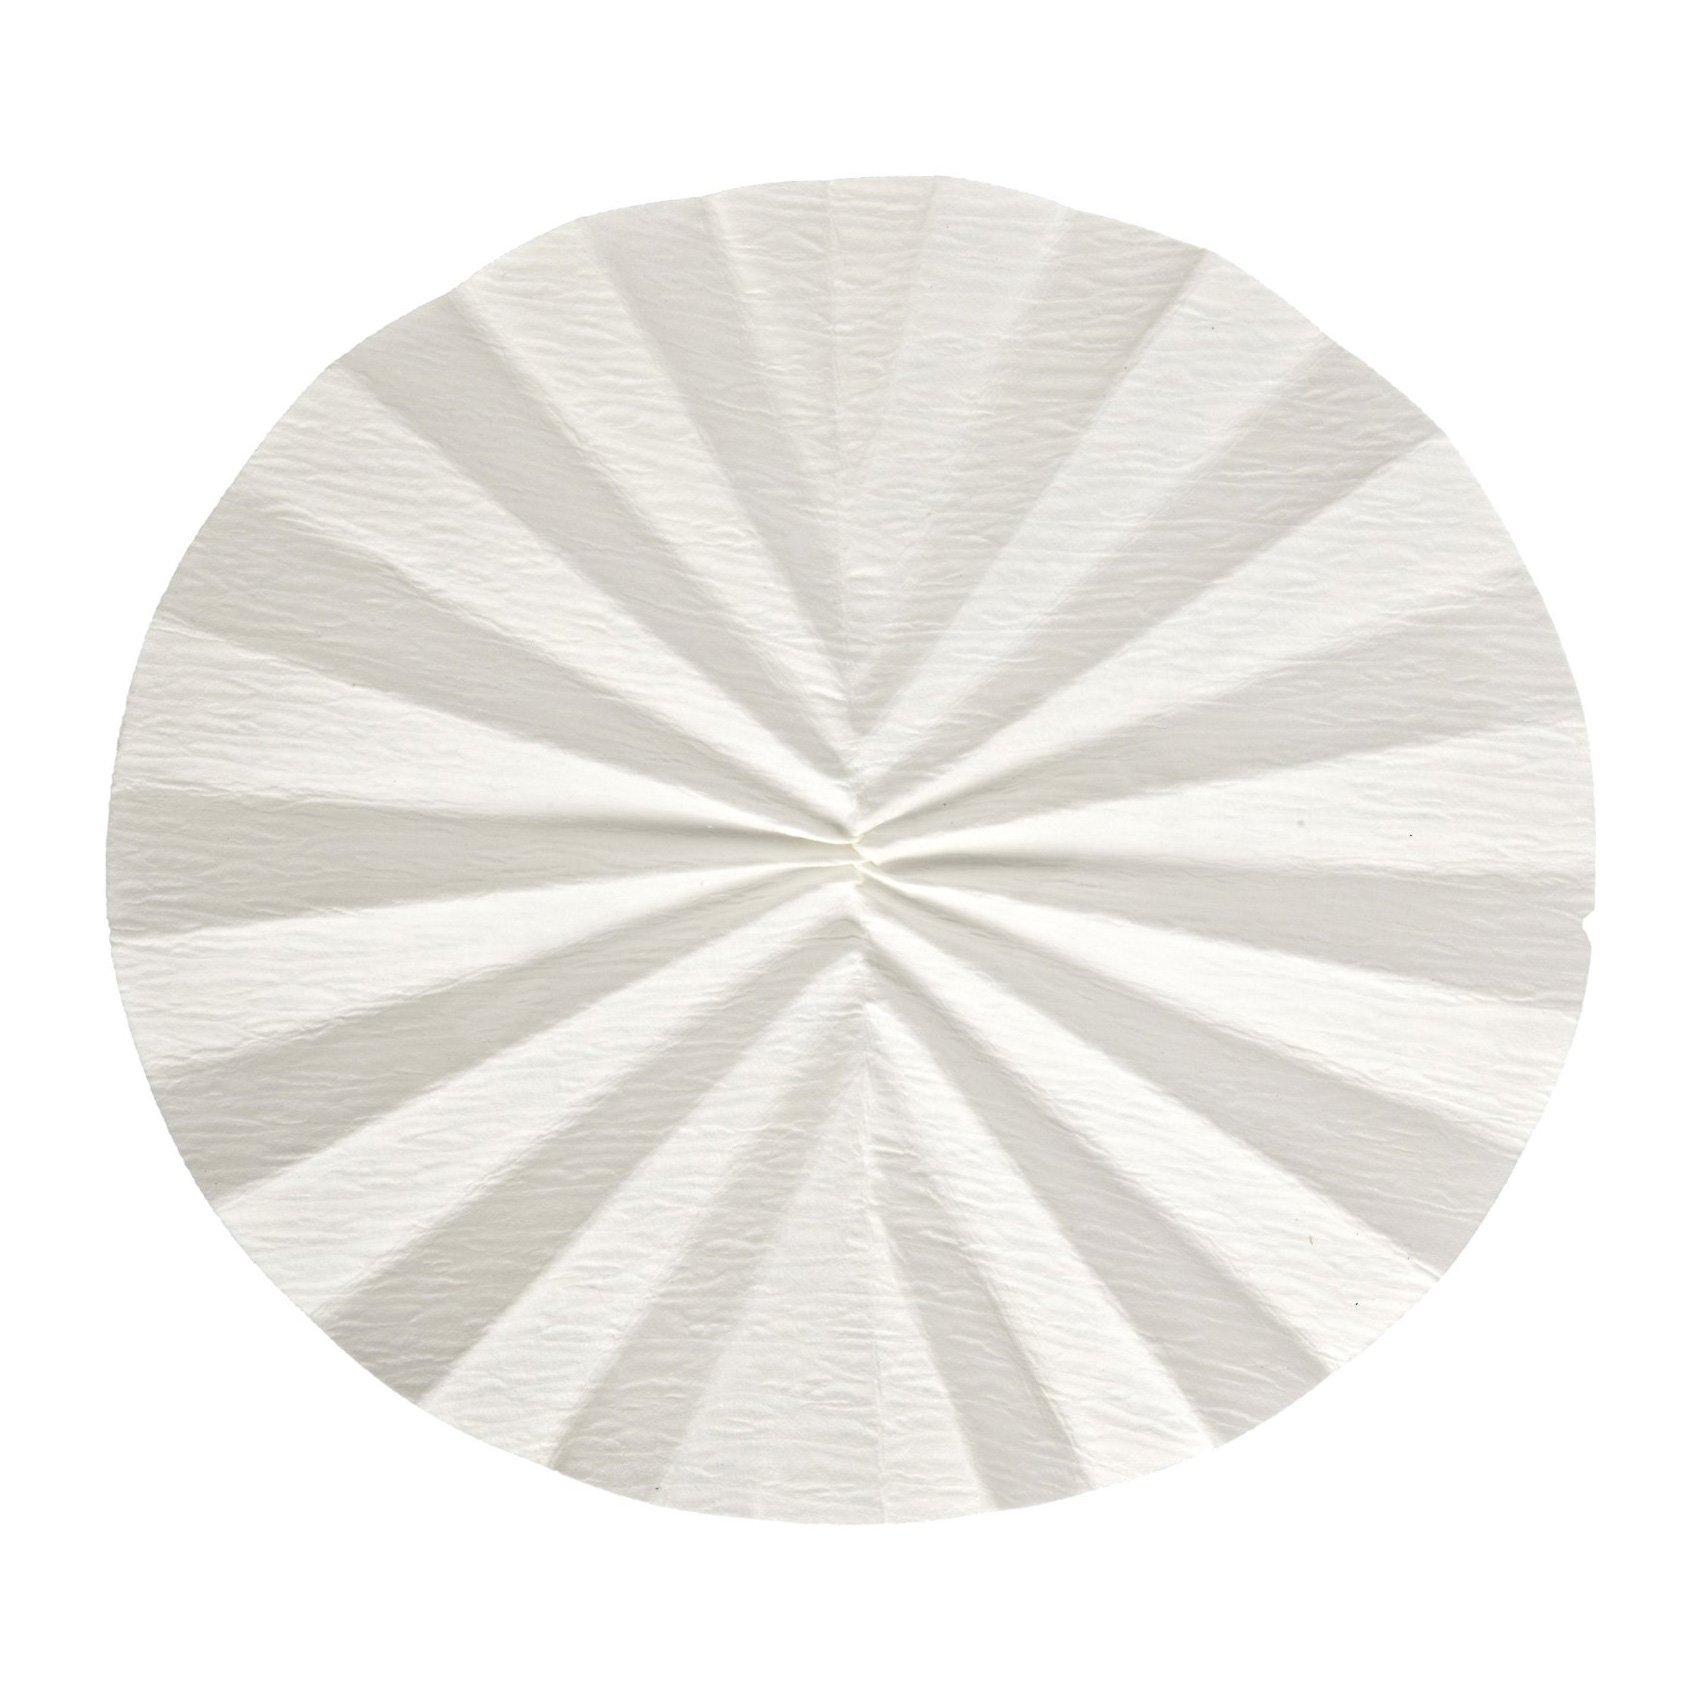 Whatman 10312647 Quantitative Folded Filter Paper, <2 Micron, Grade 602H-1/2, 185mm Diameter (Pack of 100)